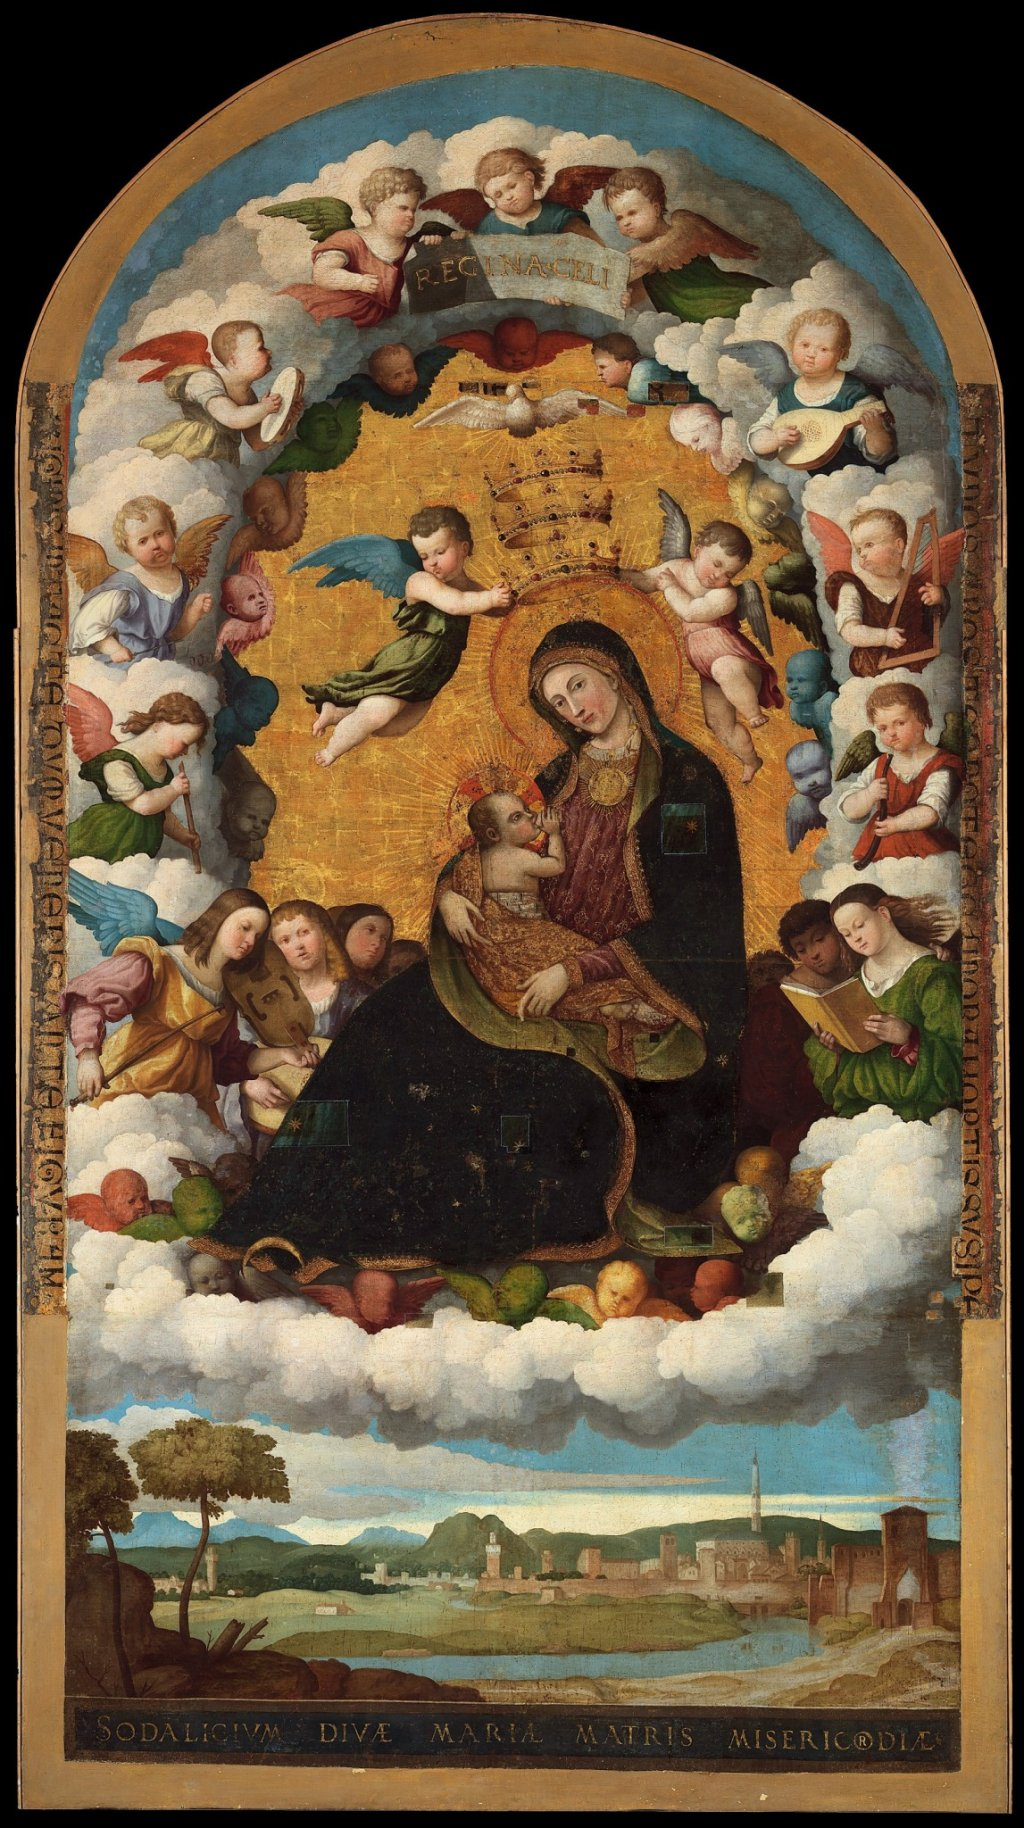 Madonna delle Stelle